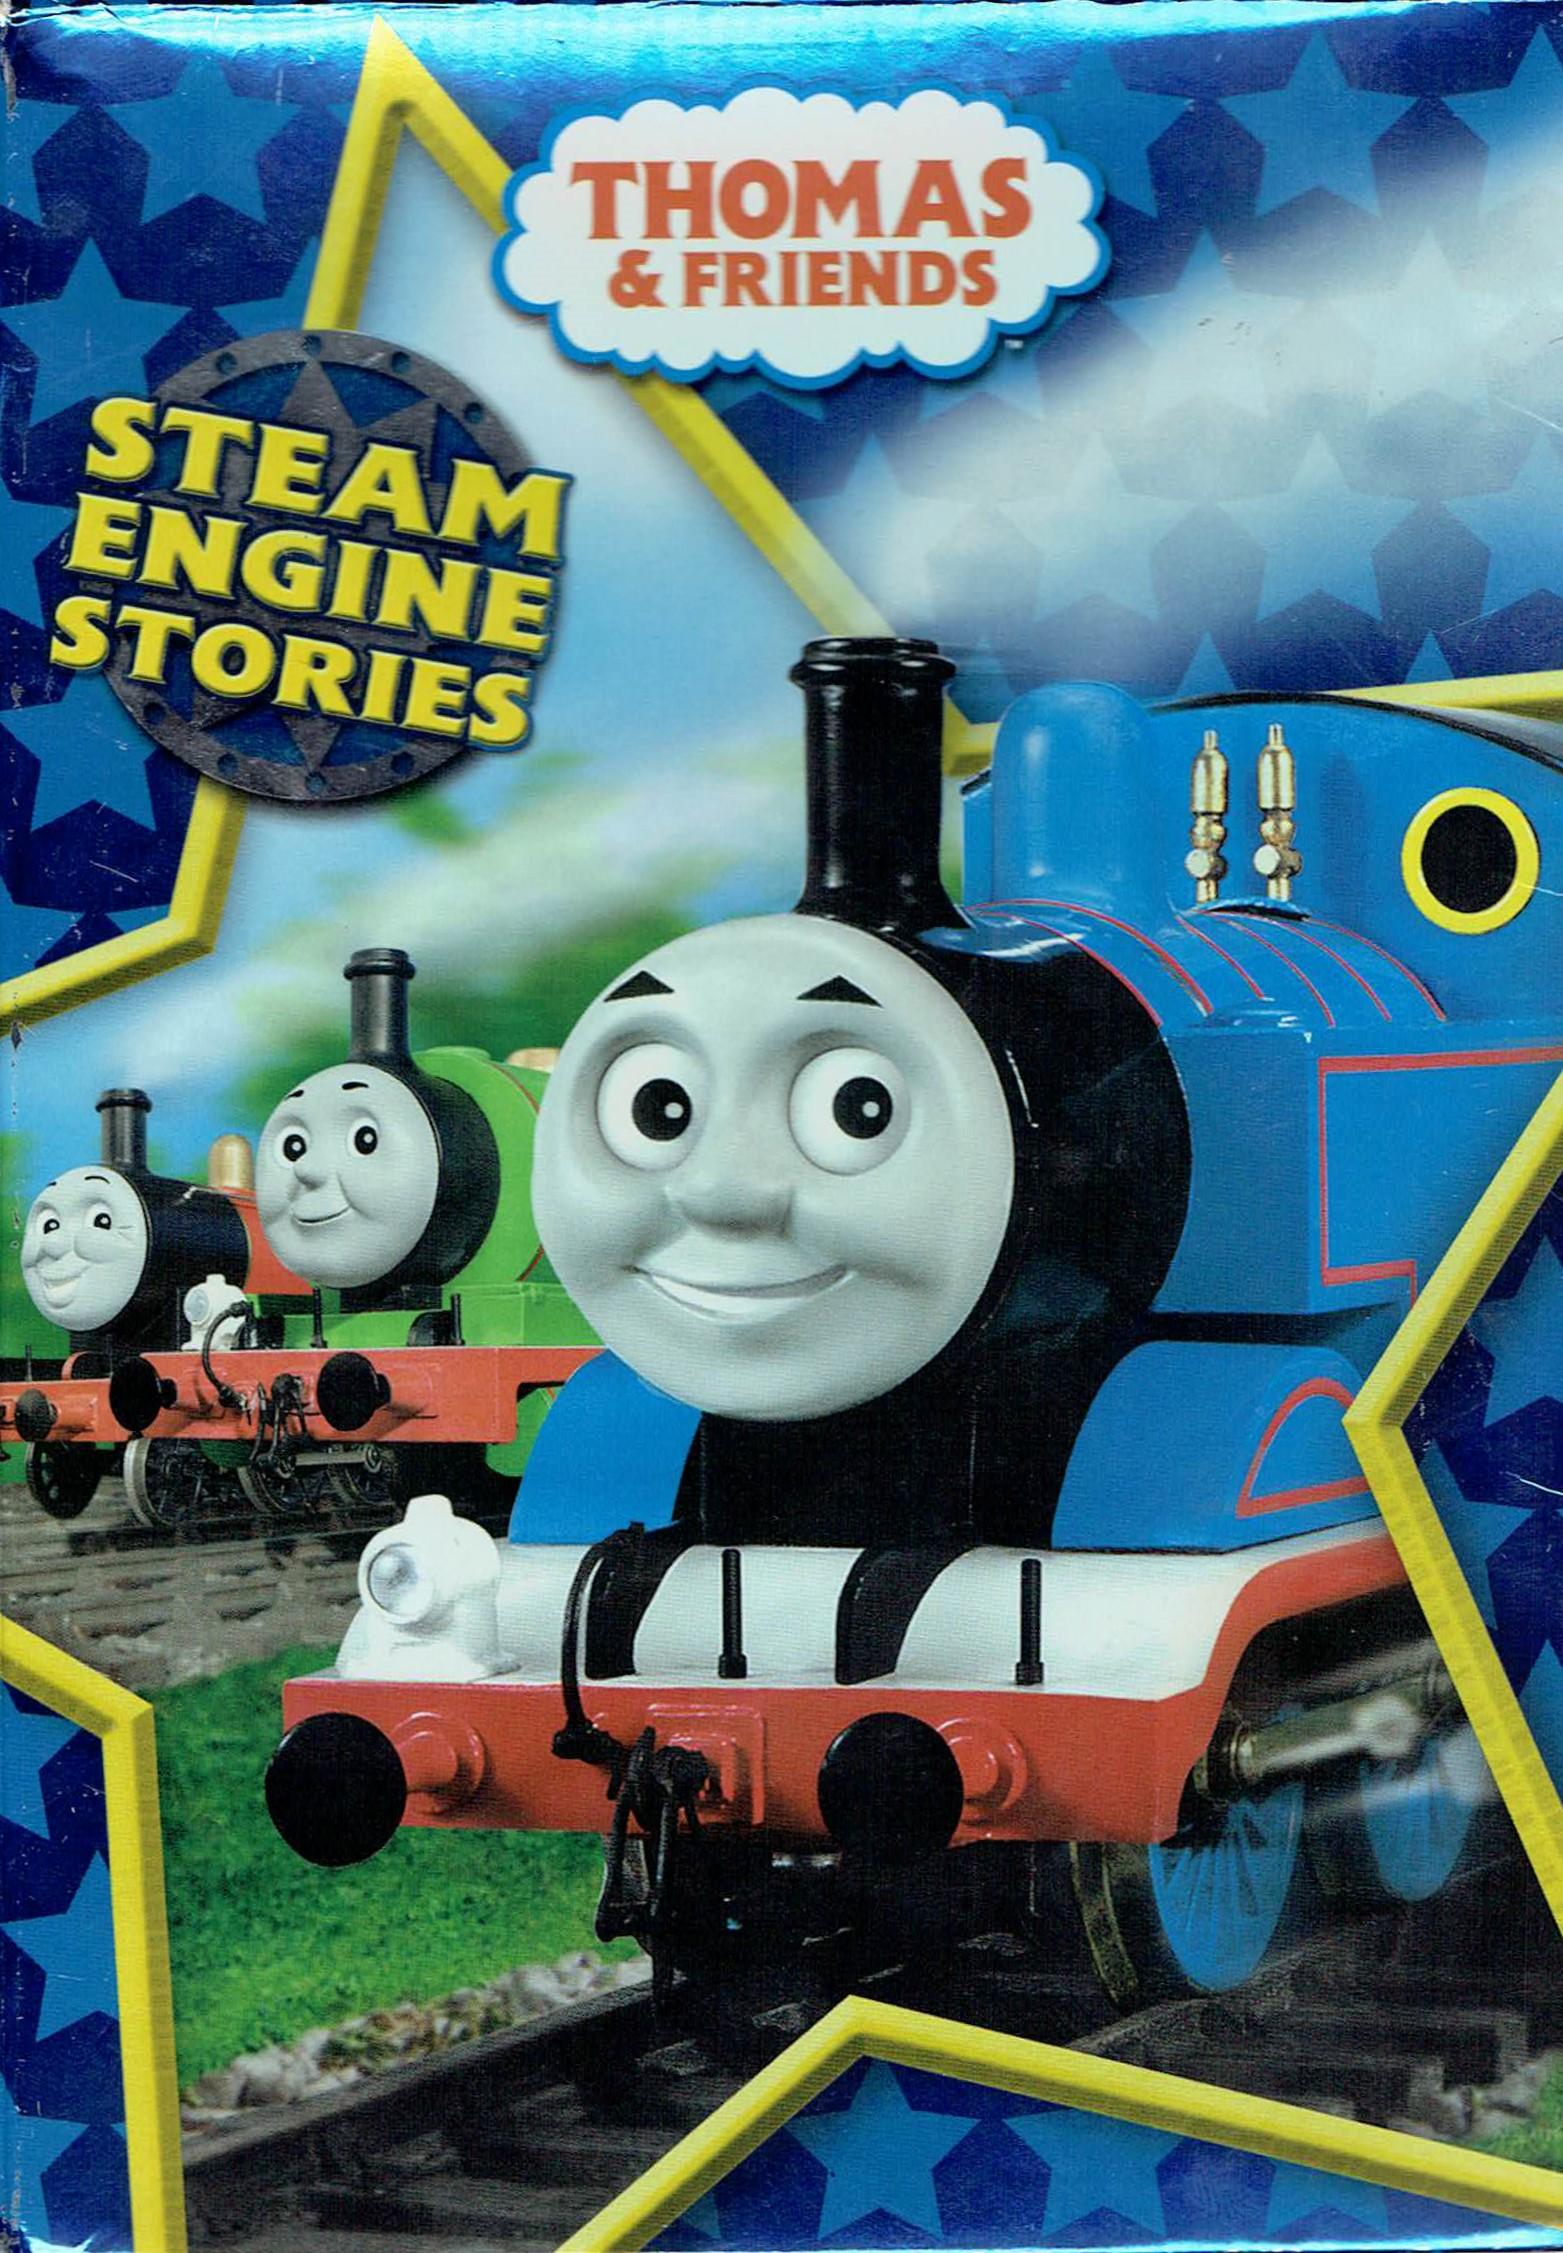 File:SteamEngineStoriesDVD.jpg